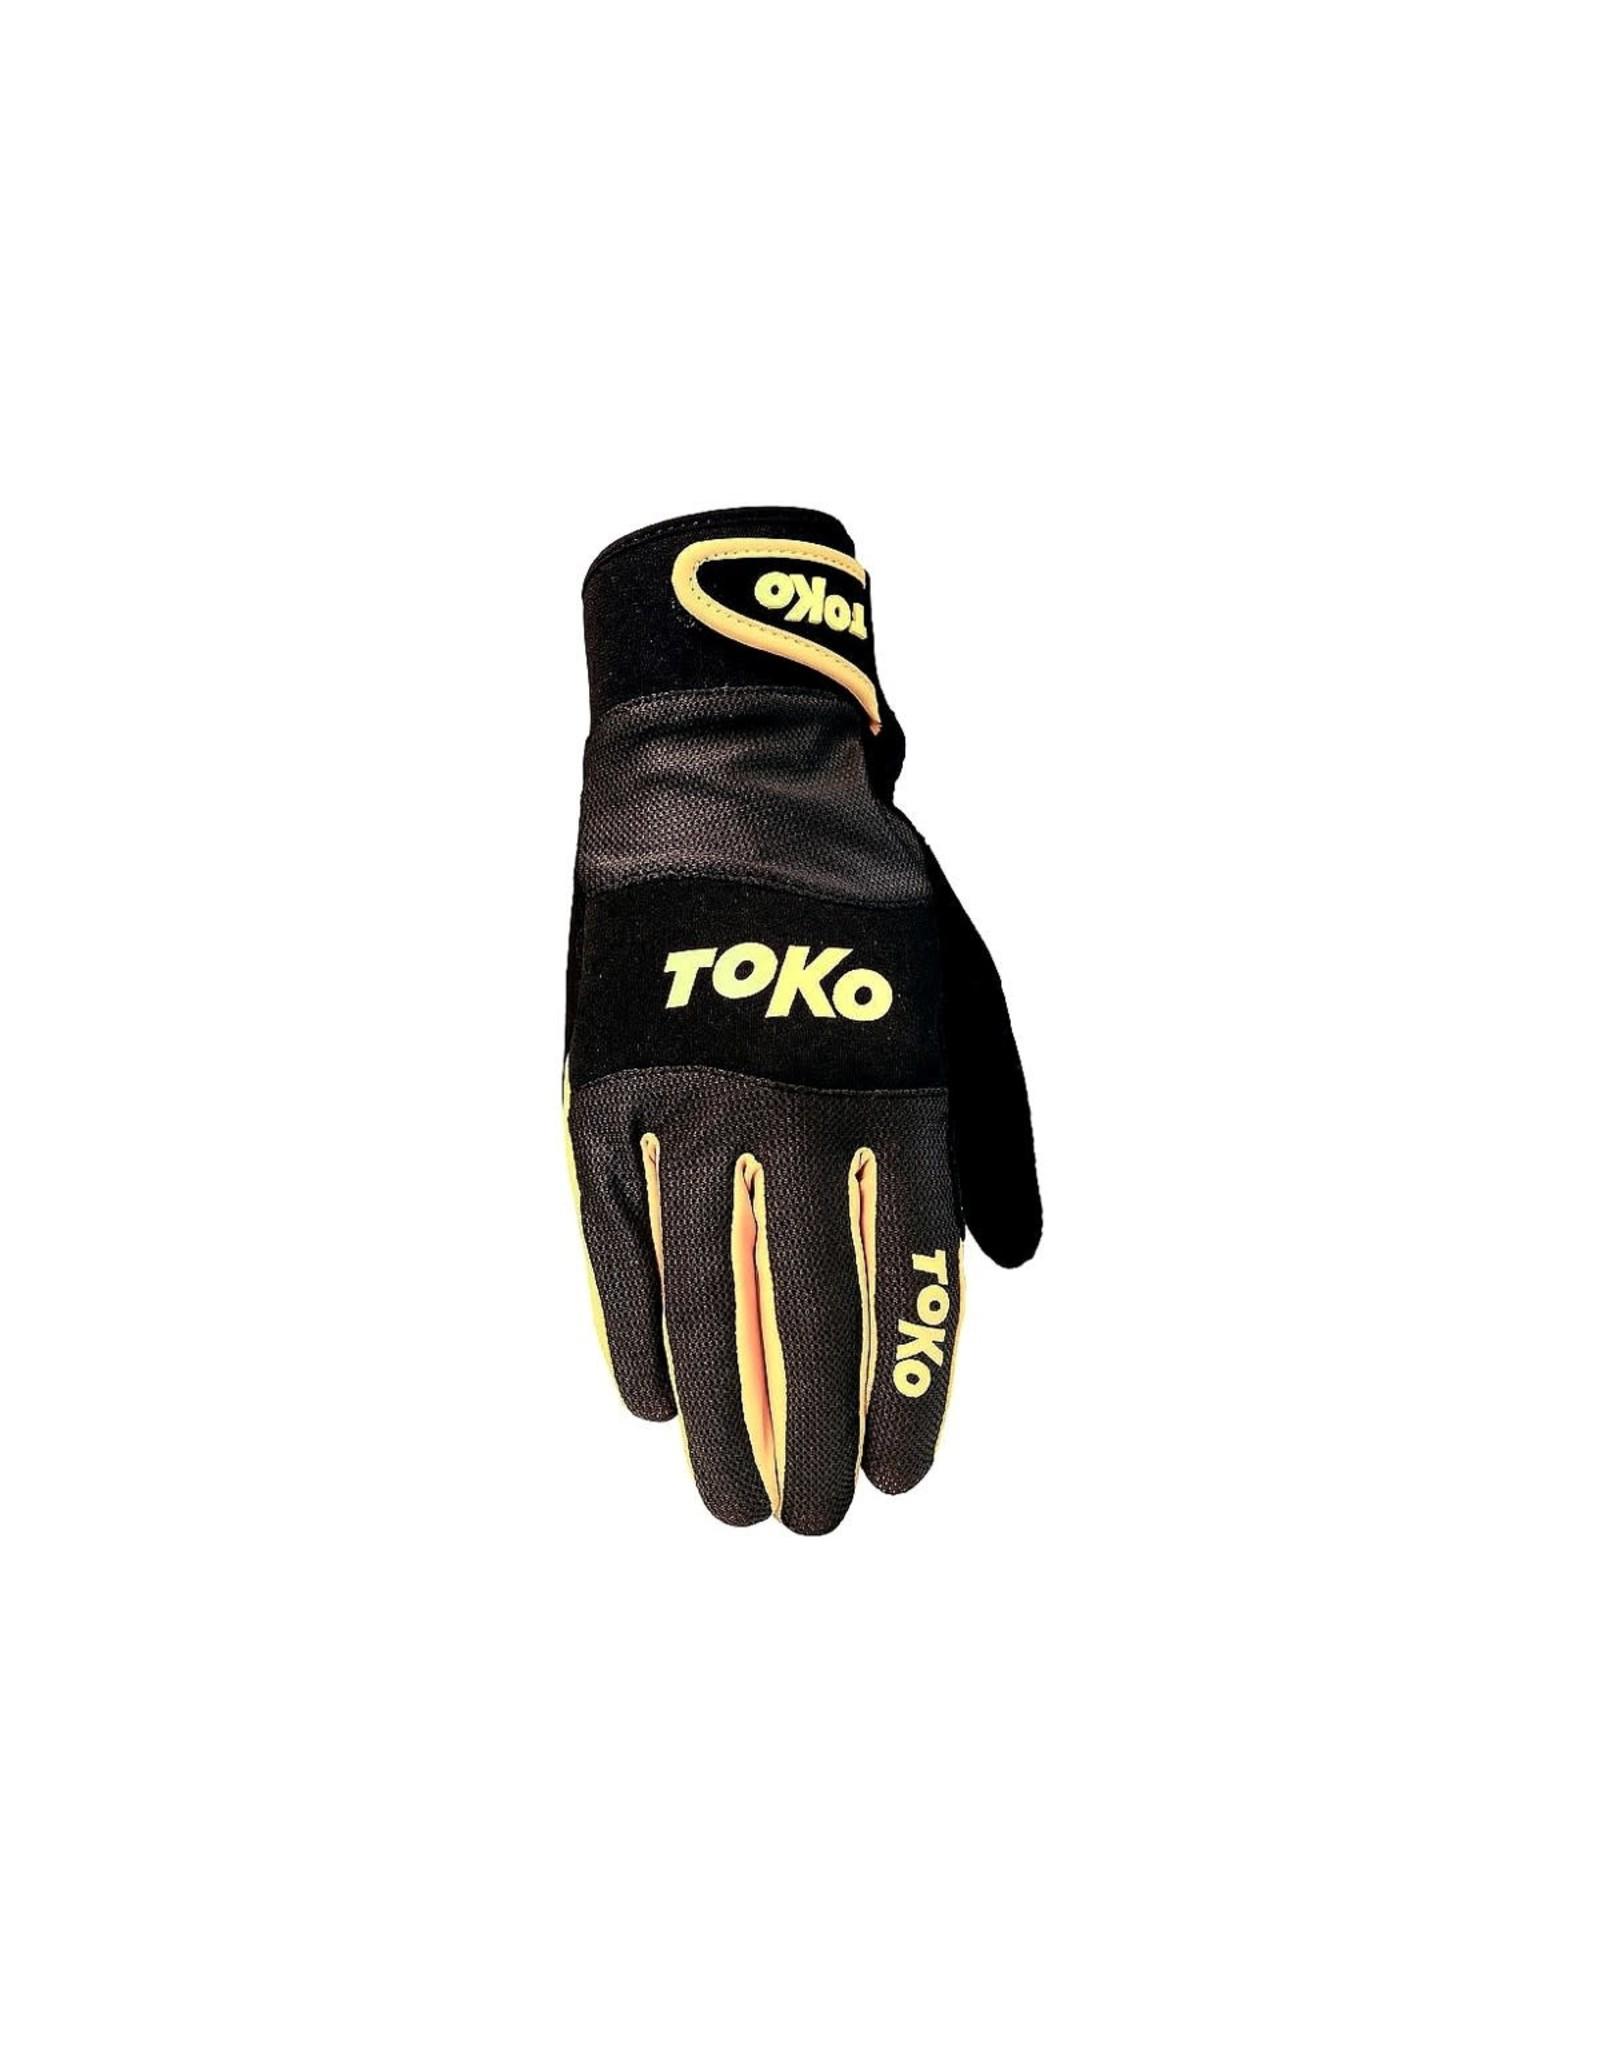 Toko Toko 3 Season Glove